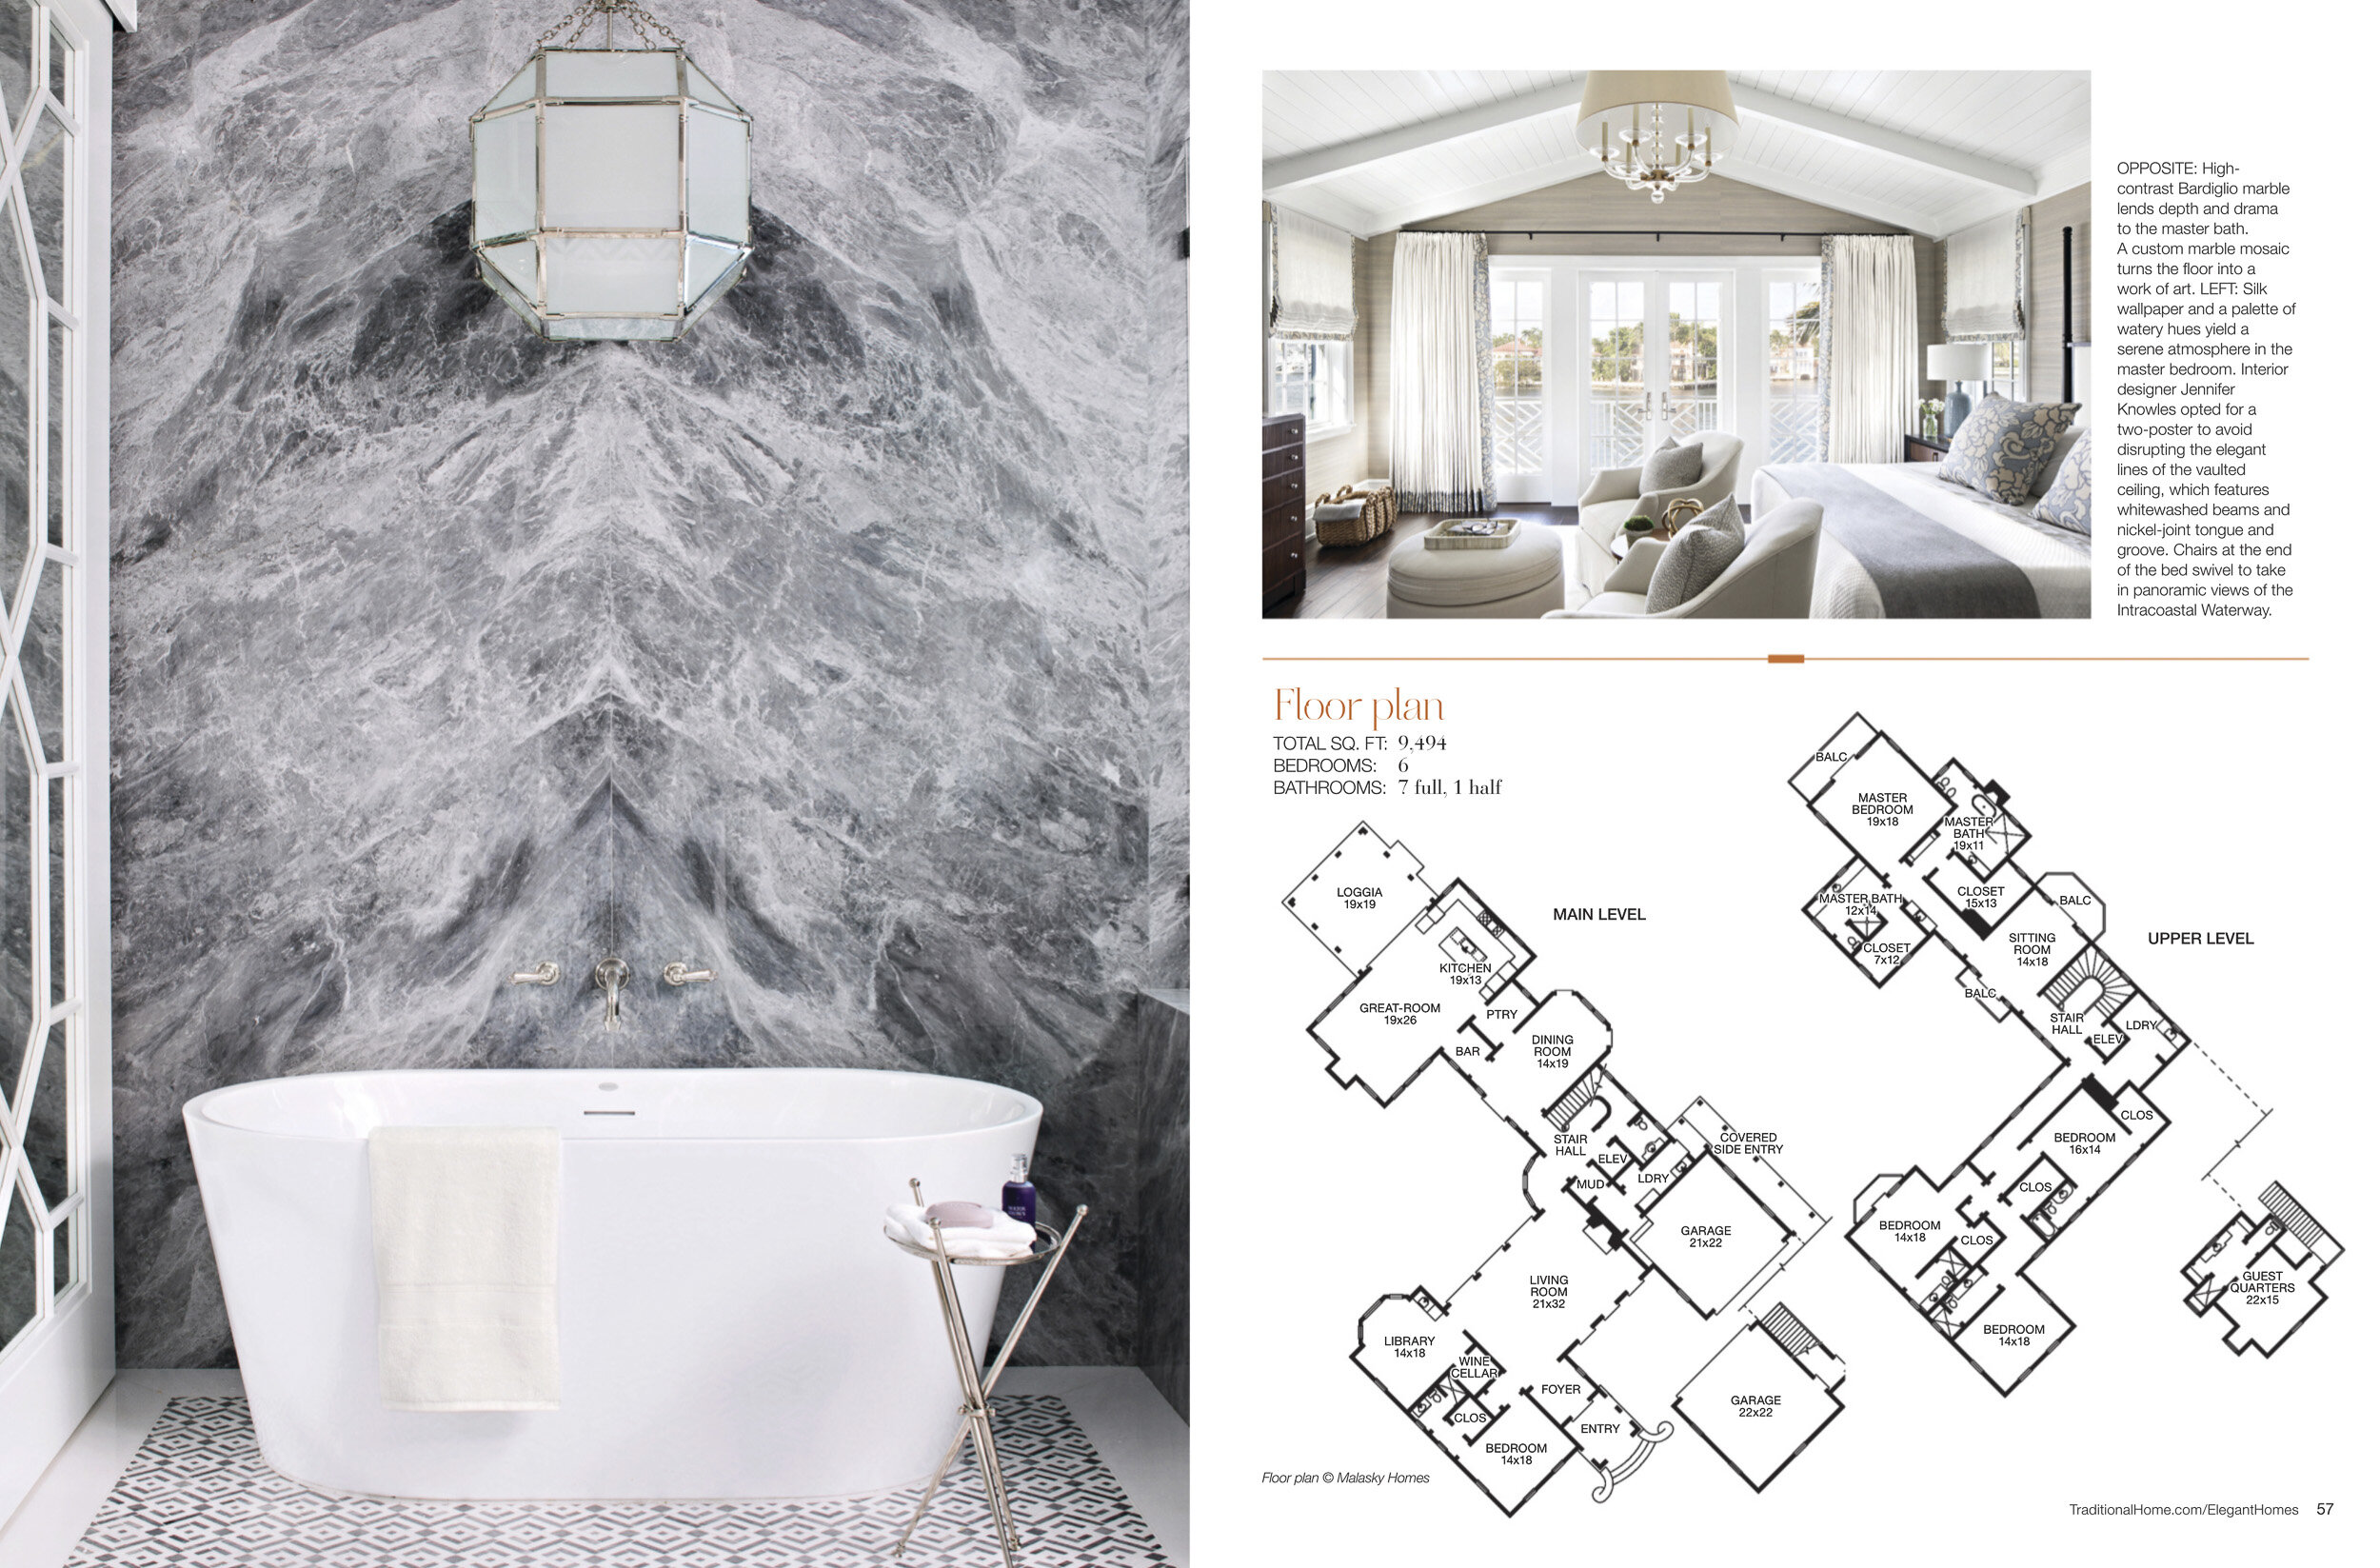 knowles-design-media-elegant-homes-fall-2019-feature-spread-05.jpg